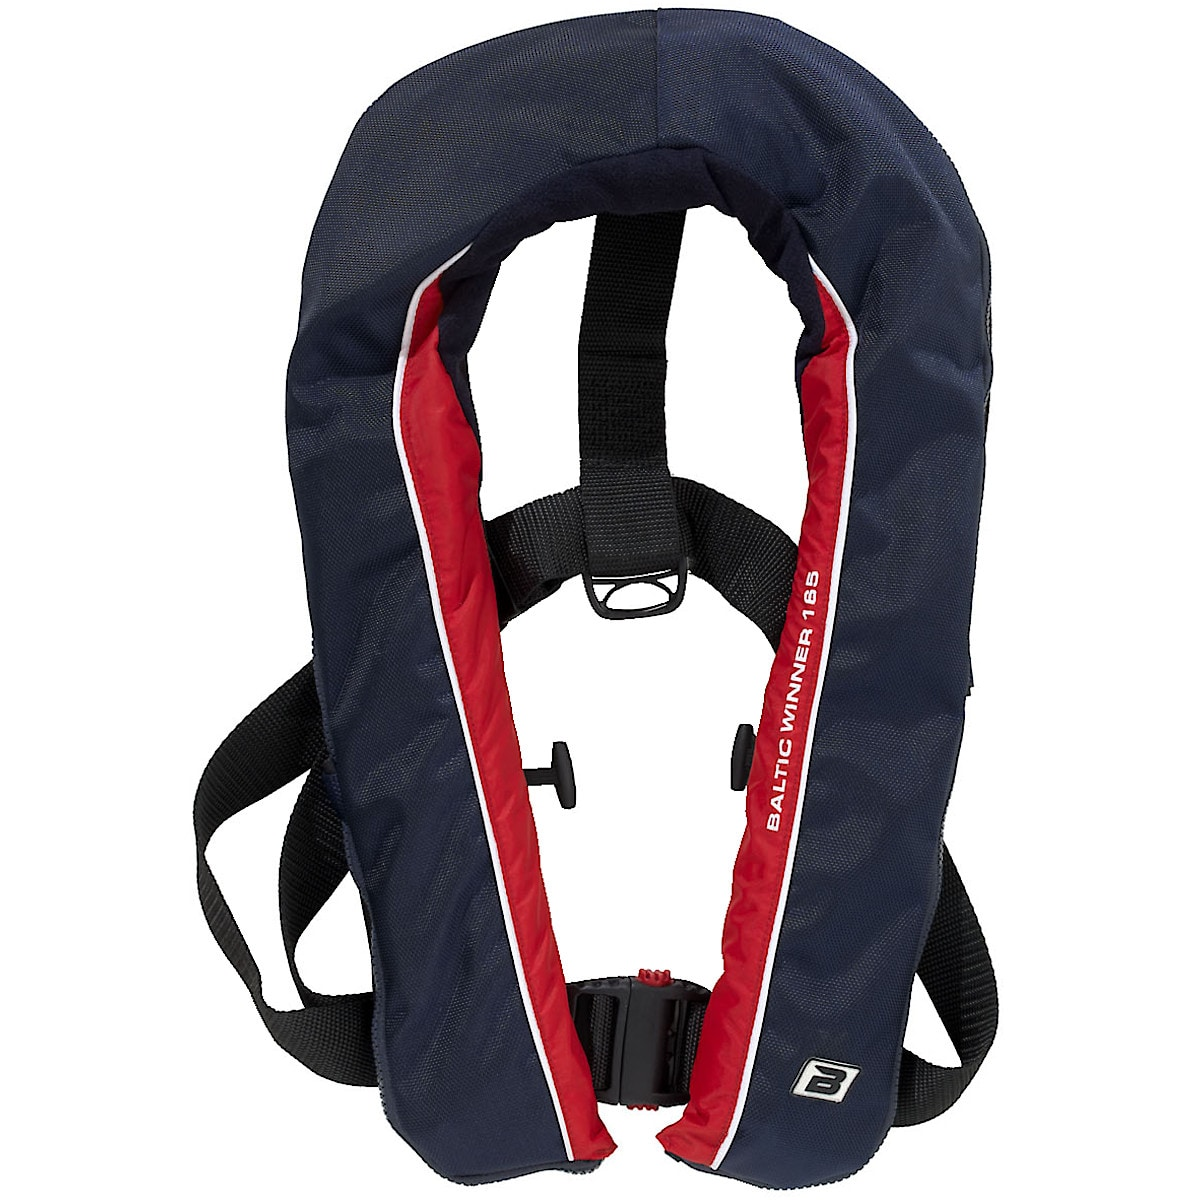 Baltic Winner 165 Inflatable Life Jacket